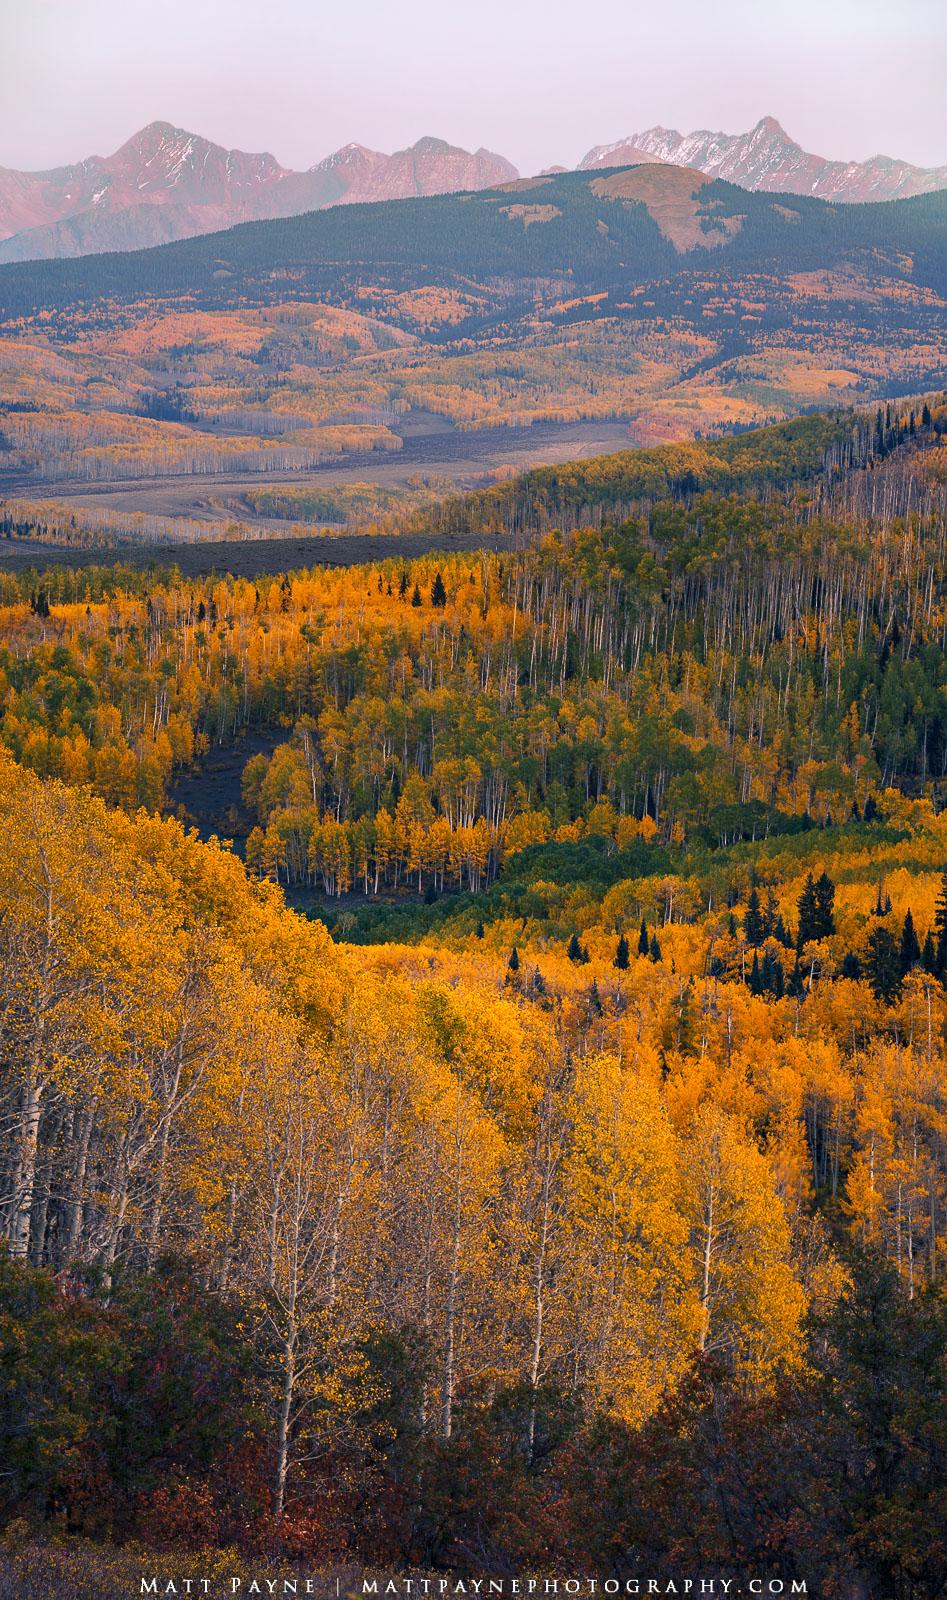 14er, Aspen Trees, Autumn, Colorado, El Diente, Fall, Fall Colors, Foliage, Landscape, Mountains, Panorama, San Juan Mountains, Vertical, Wilson Peak, colorful, landscape photography, scrub oak, photo